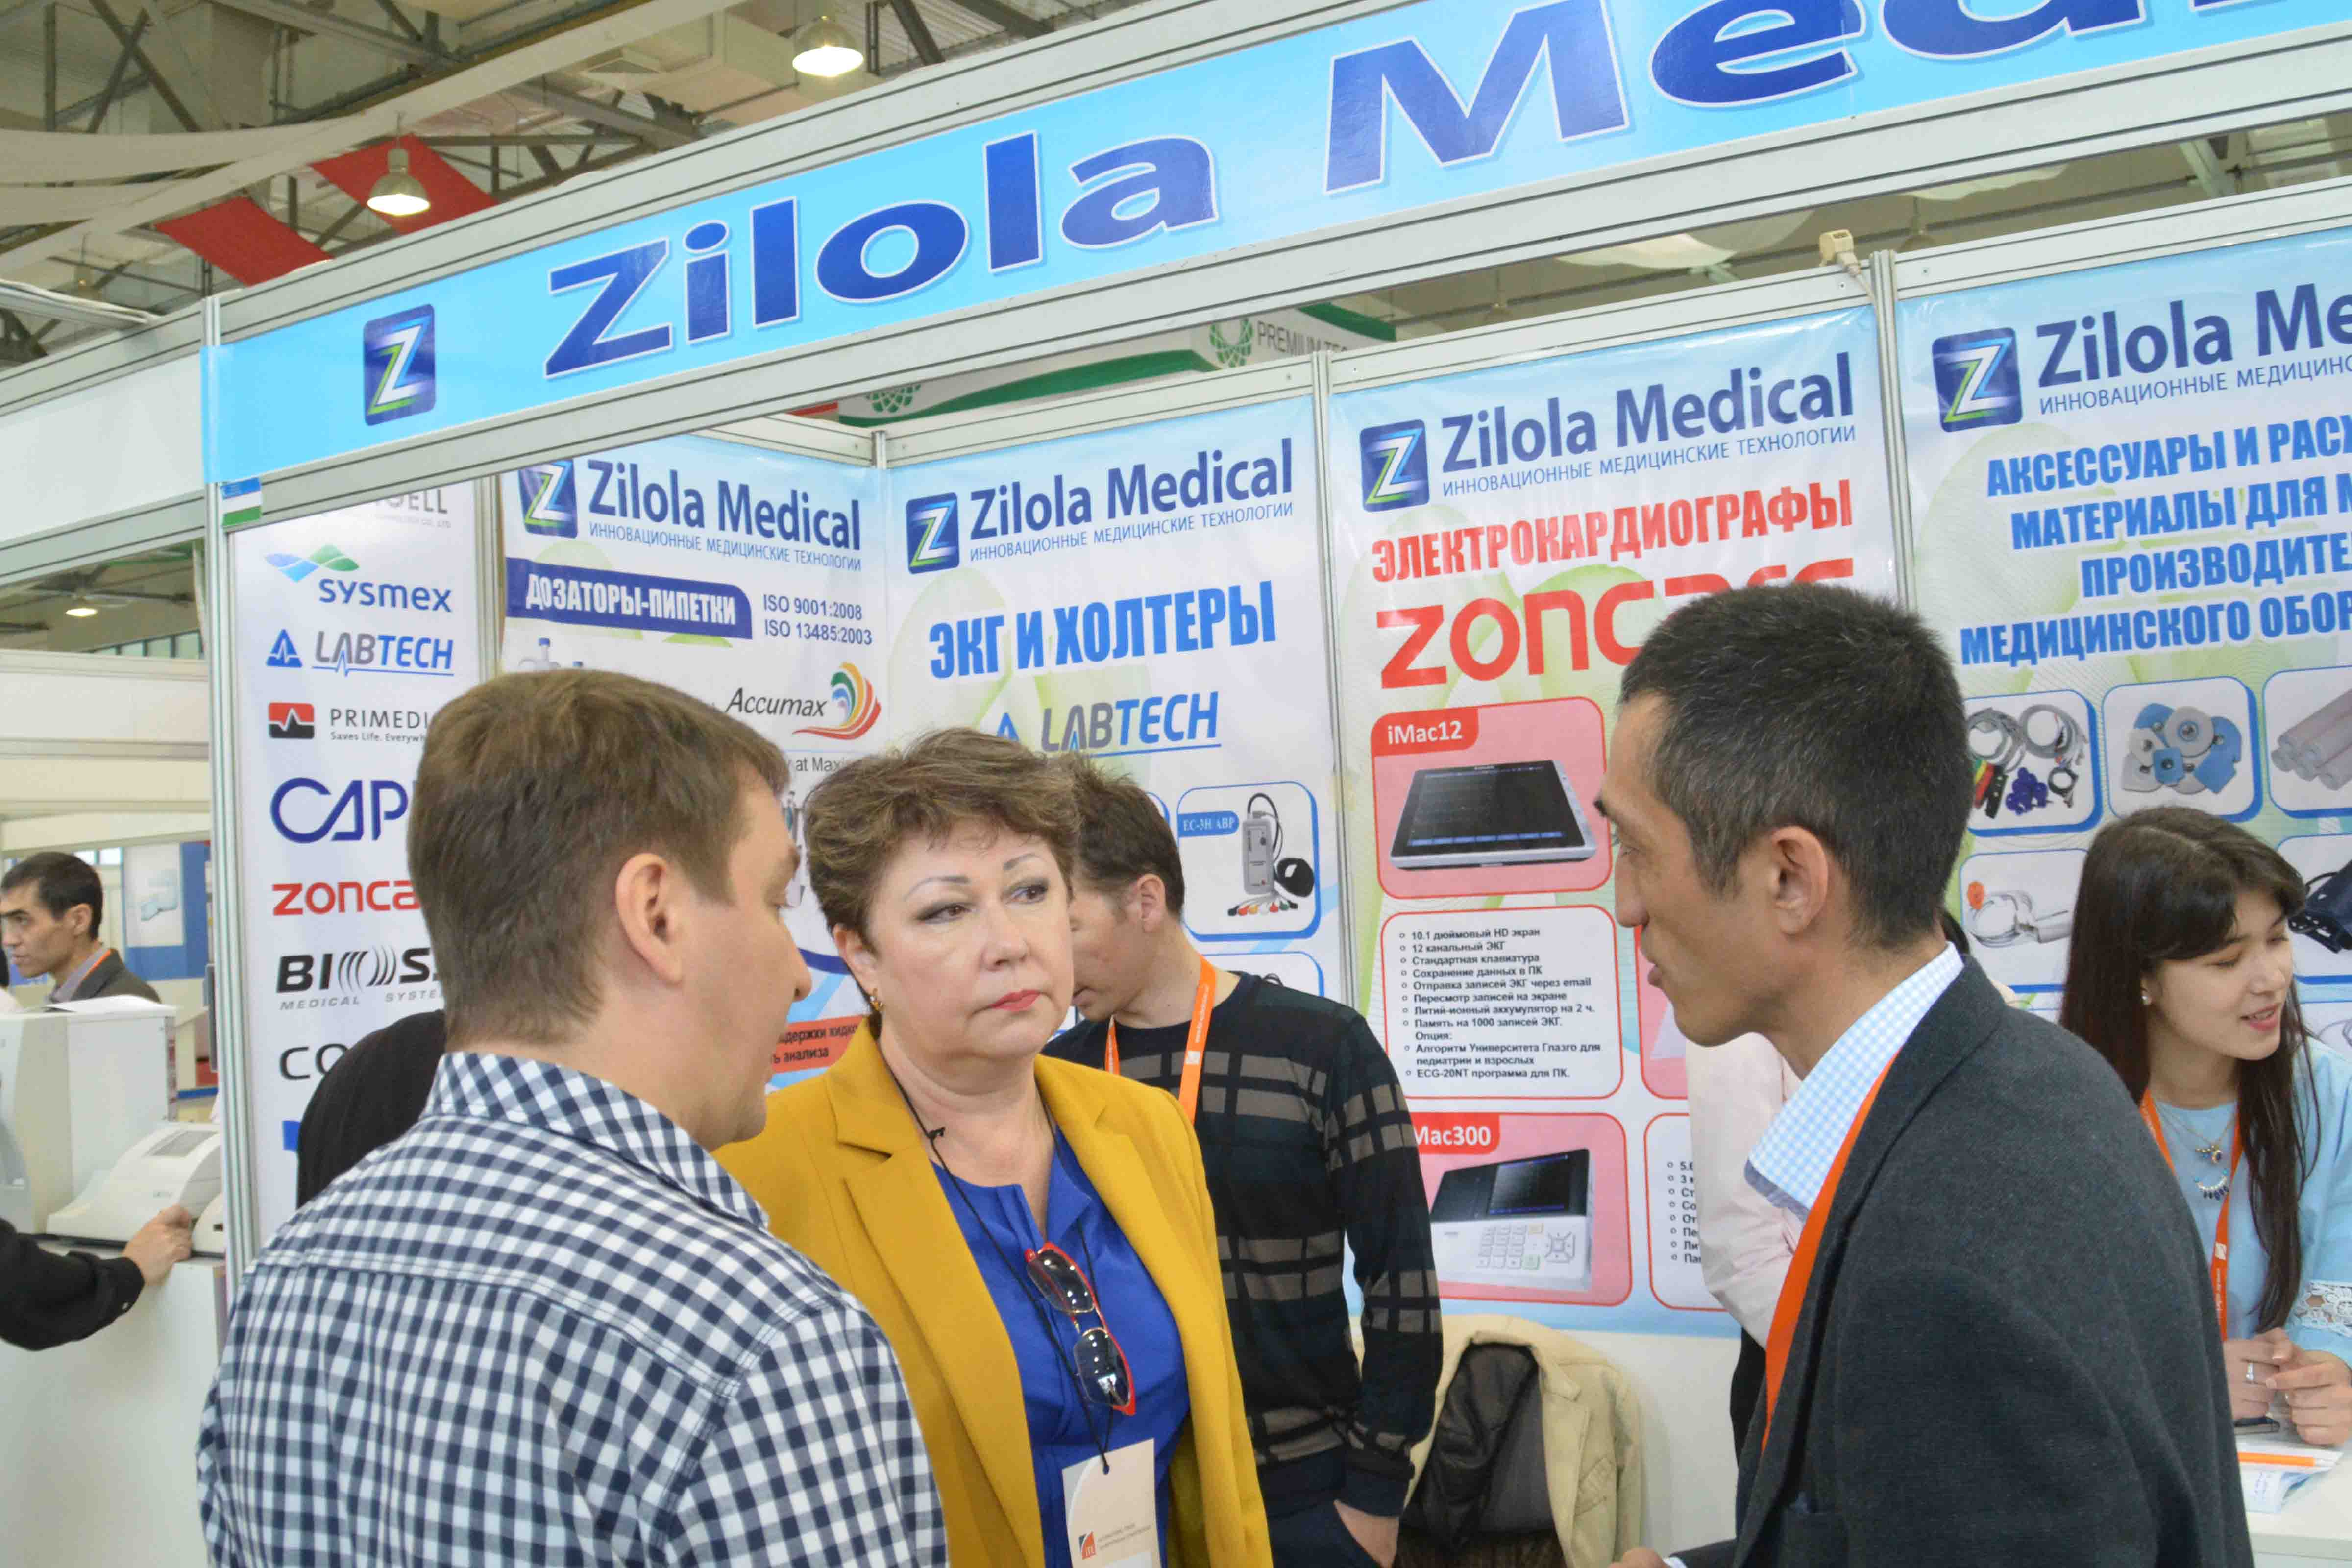 http://medicalexpress.ru/uploads/news/Tihe%202017/8.JPG